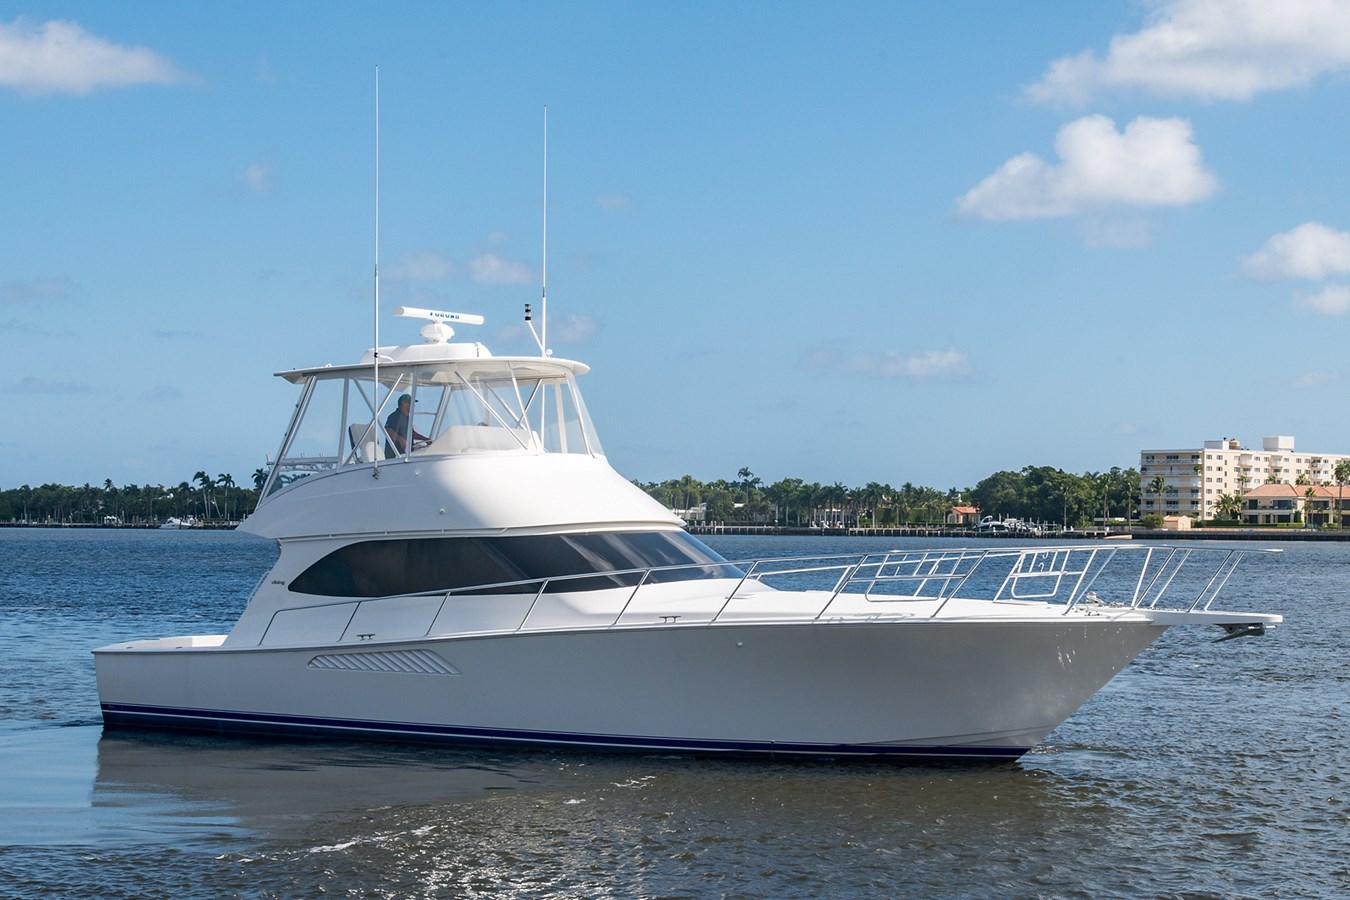 Orion_Bow Profile1 2009 VIKING 50 Convertible Sport Fisherman 2941786